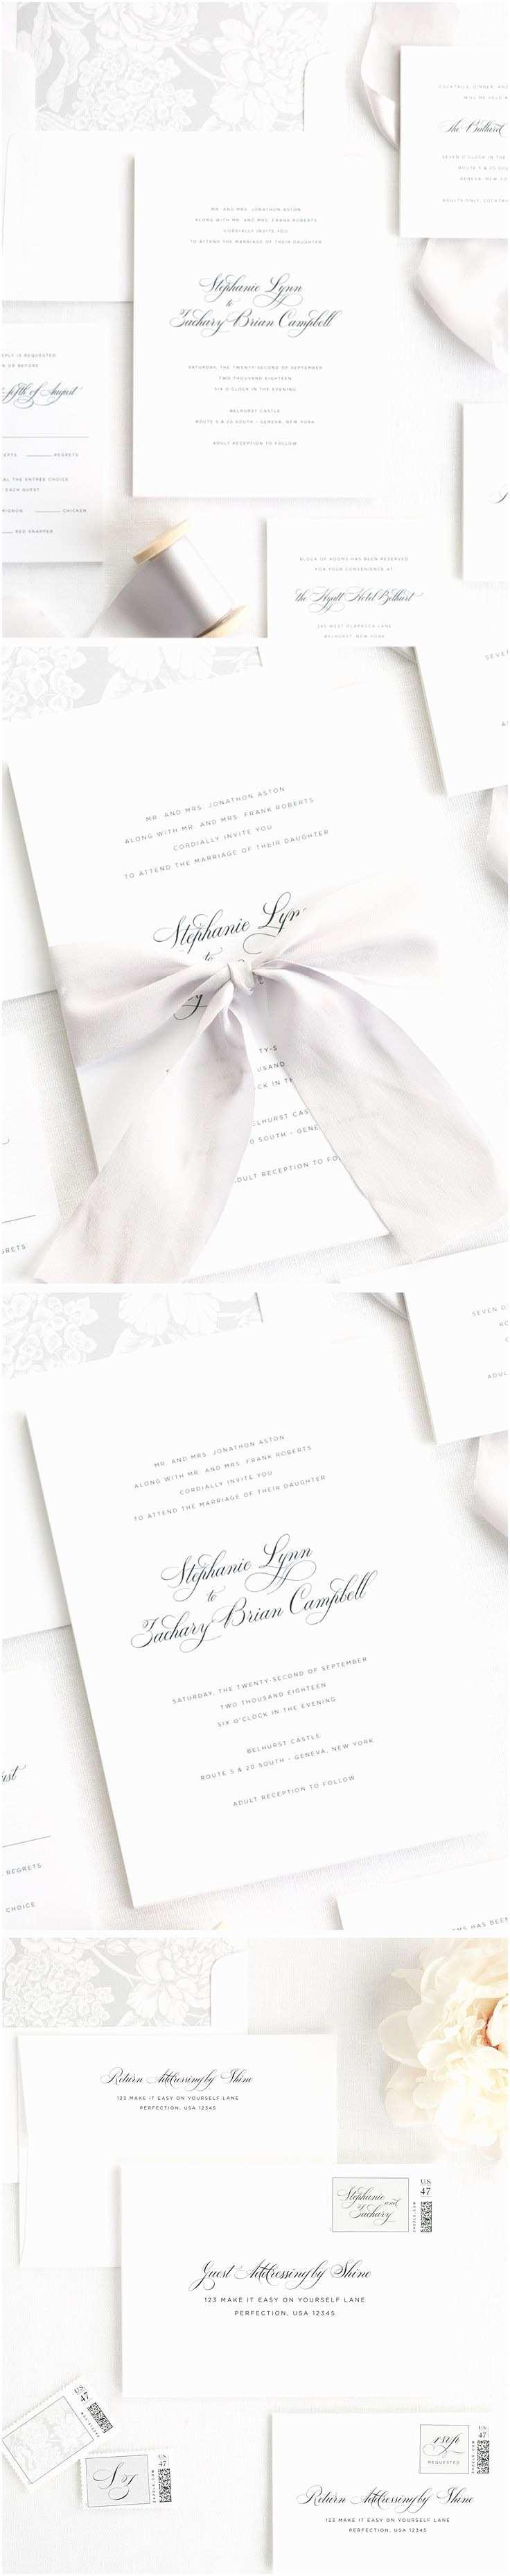 Wedding Invitation Addressing Service 25 Best Ideas About Addressing Wedding Invitations On